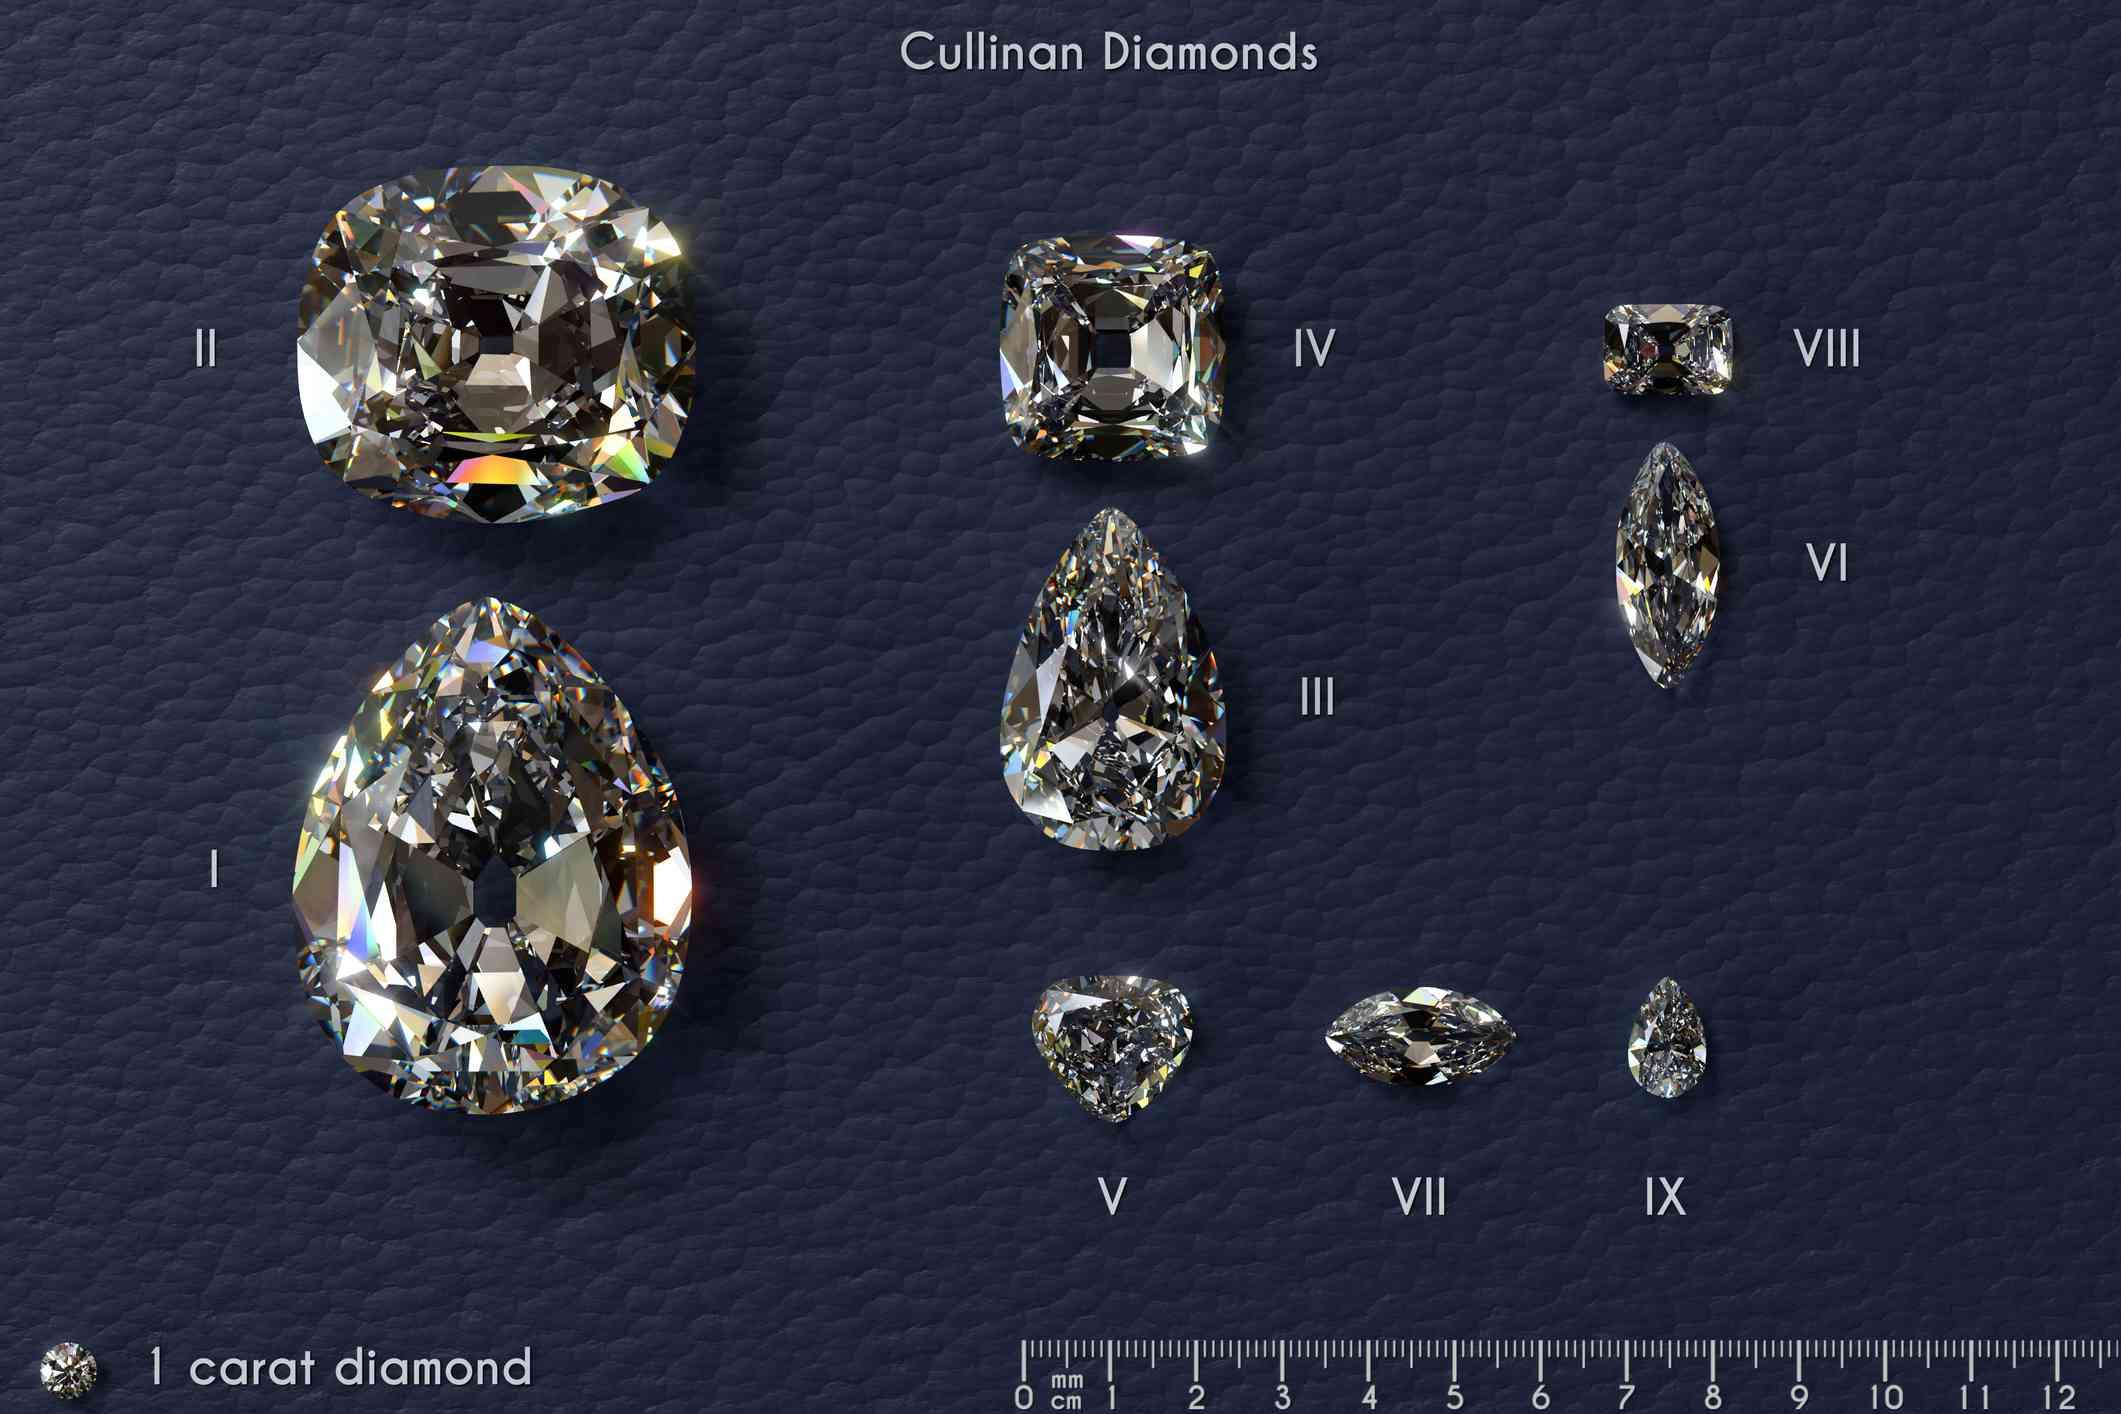 Replica Cullinan diamonds on a leather background